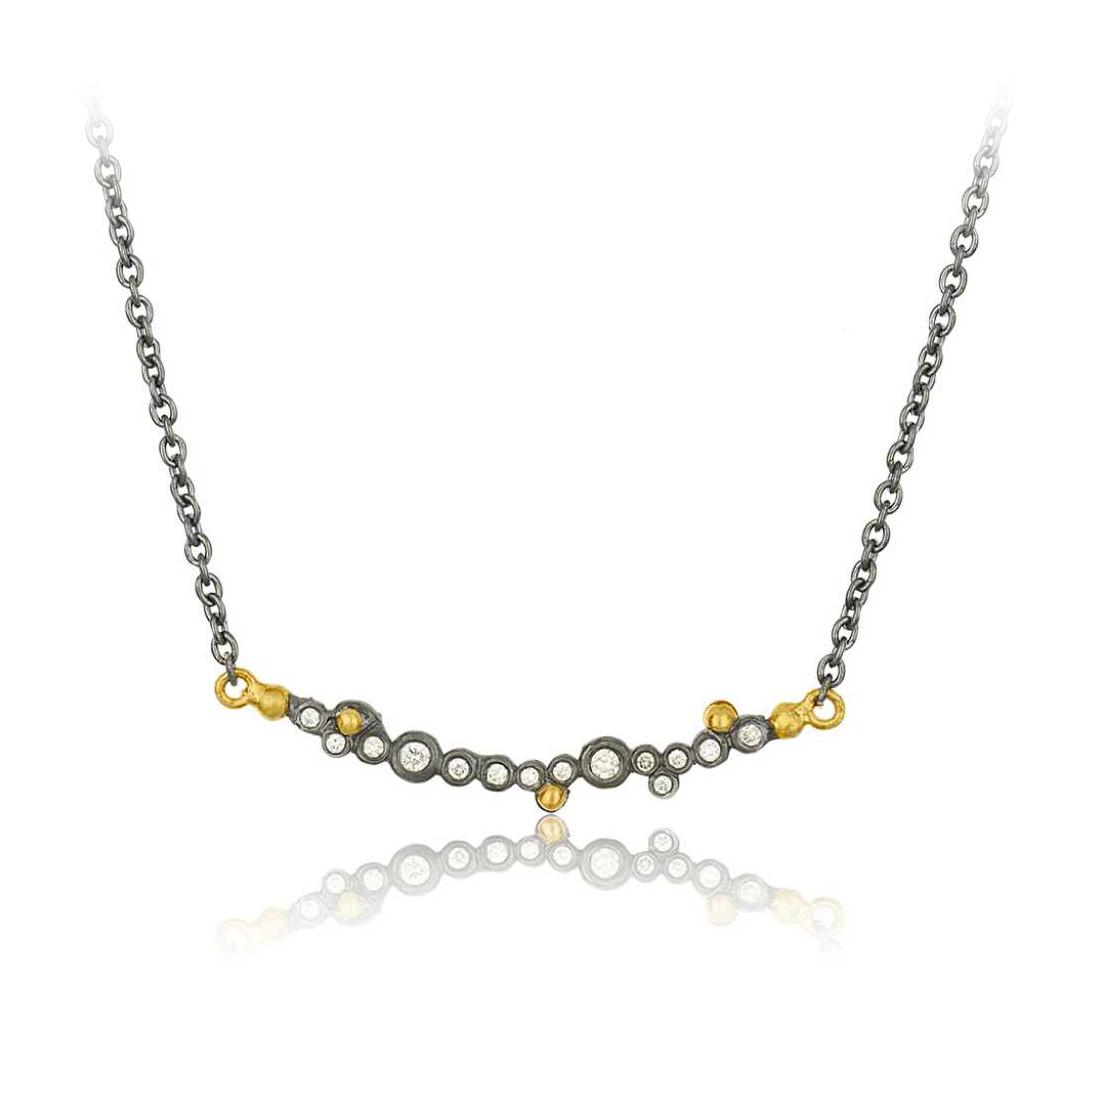 "Lika Behar 24 Karat Yellow Gold and Oxidized Silver Diamond ""Dylan"" Bar Necklace"